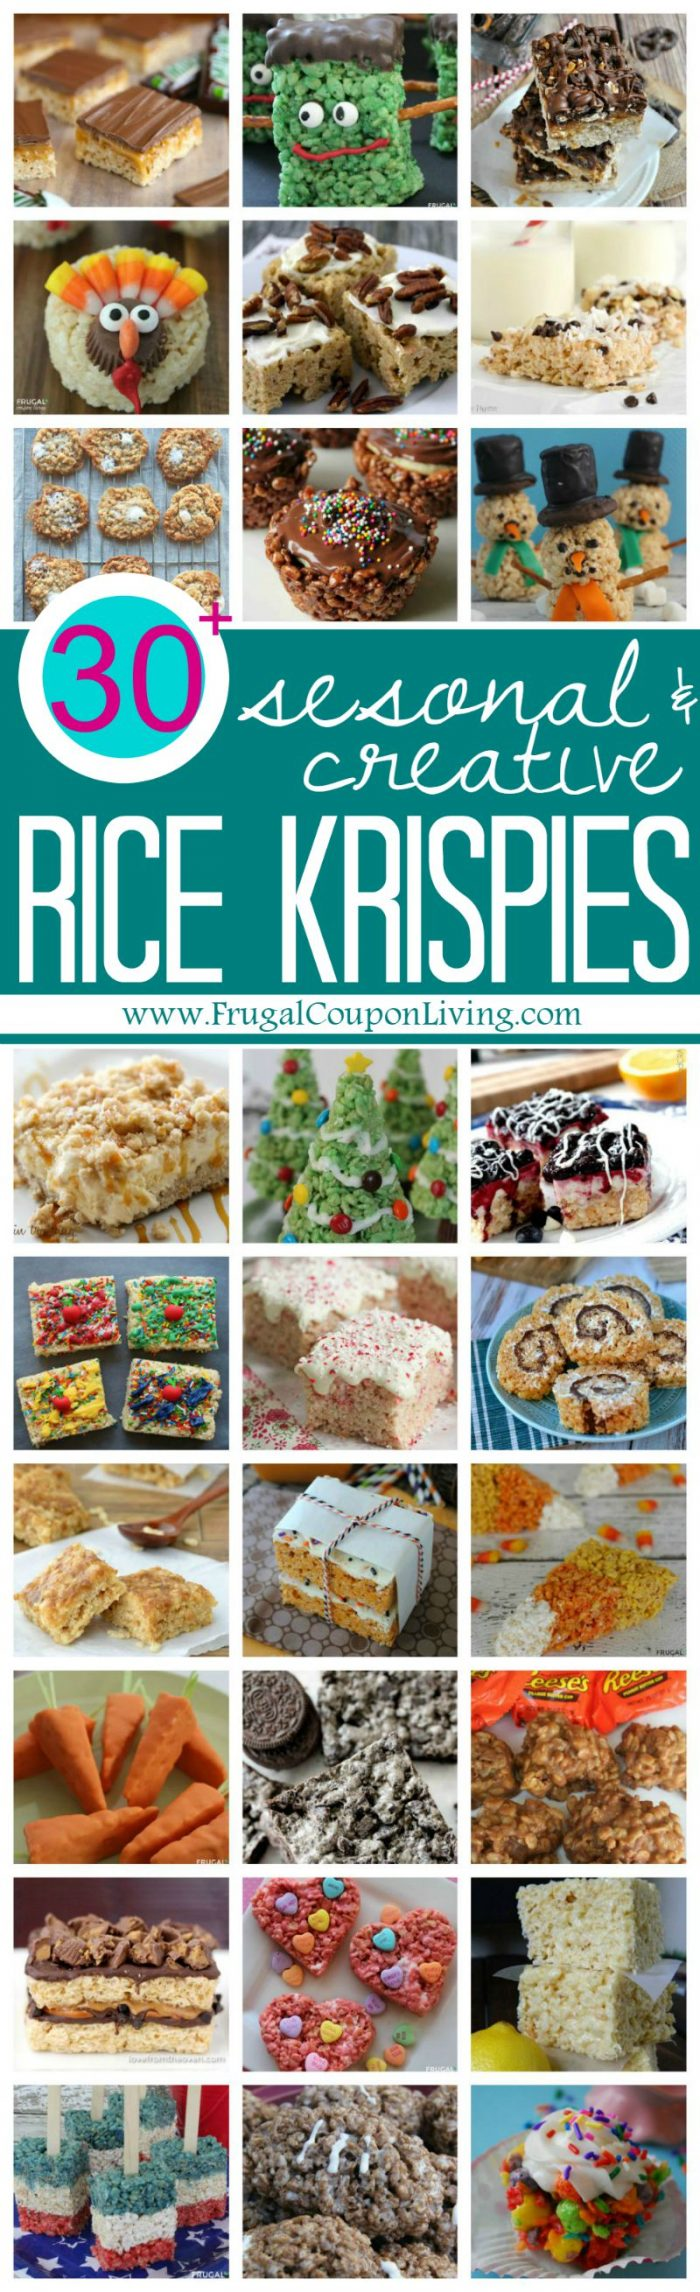 Rice Krispie Treats Recipes for all Seasons